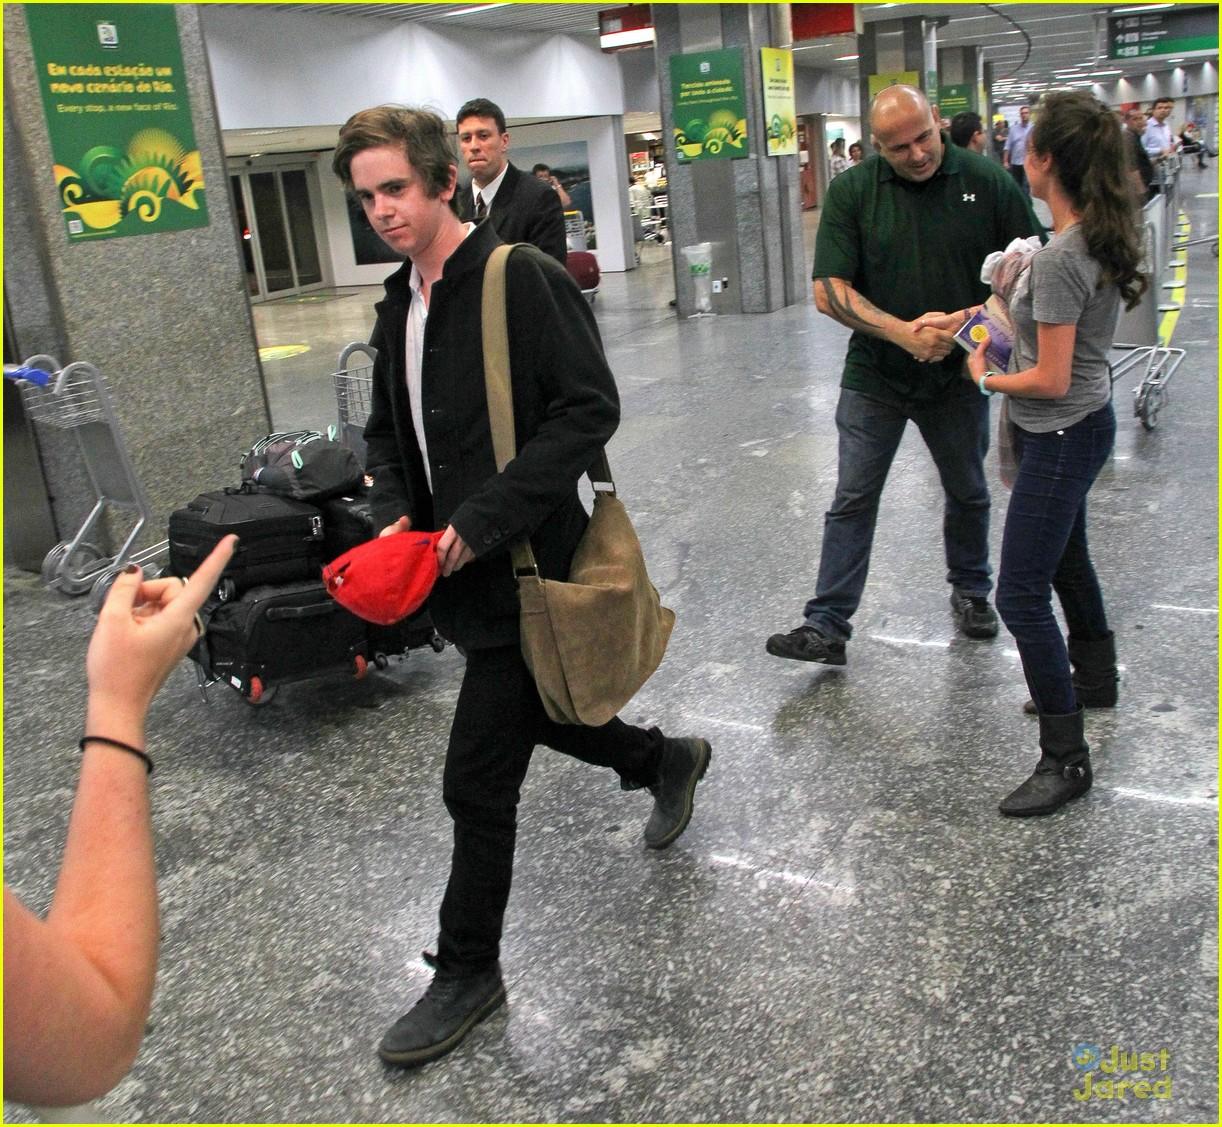 Freddie Highmore Visits South America! | Photo 570576 ...